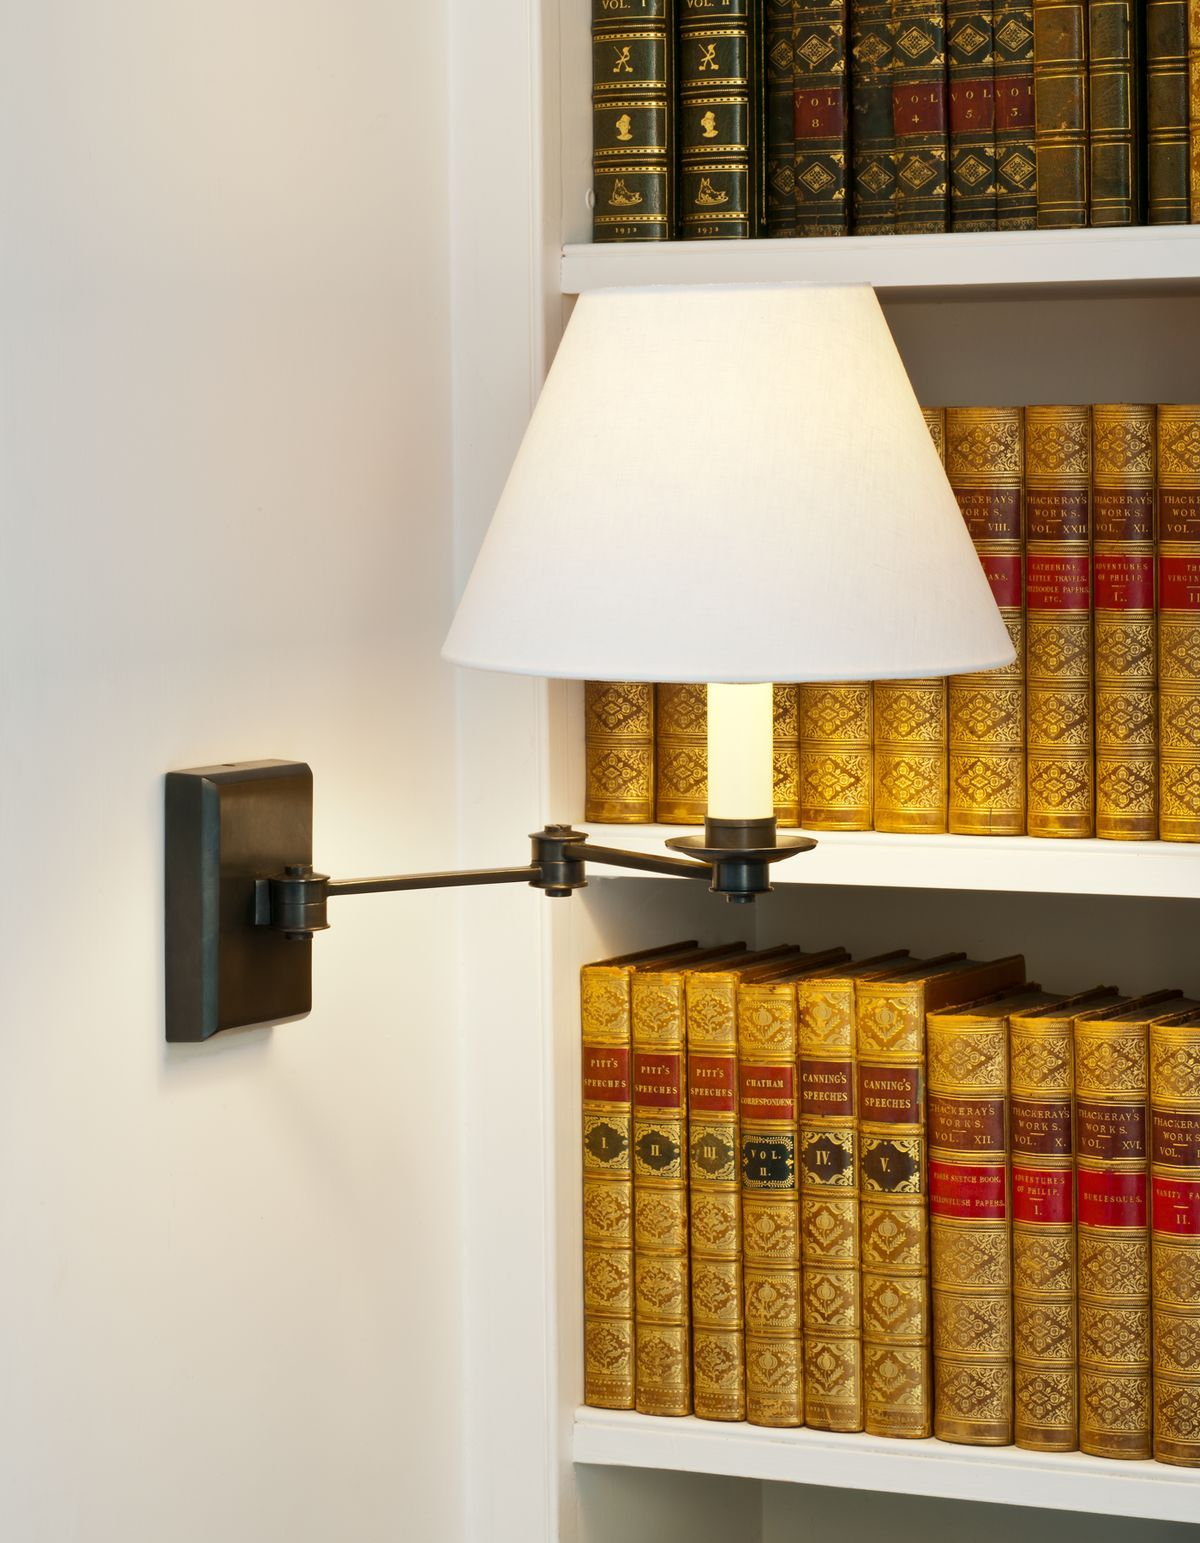 Preston Swing Arm Wall Light Vaughan Designs Lighting In